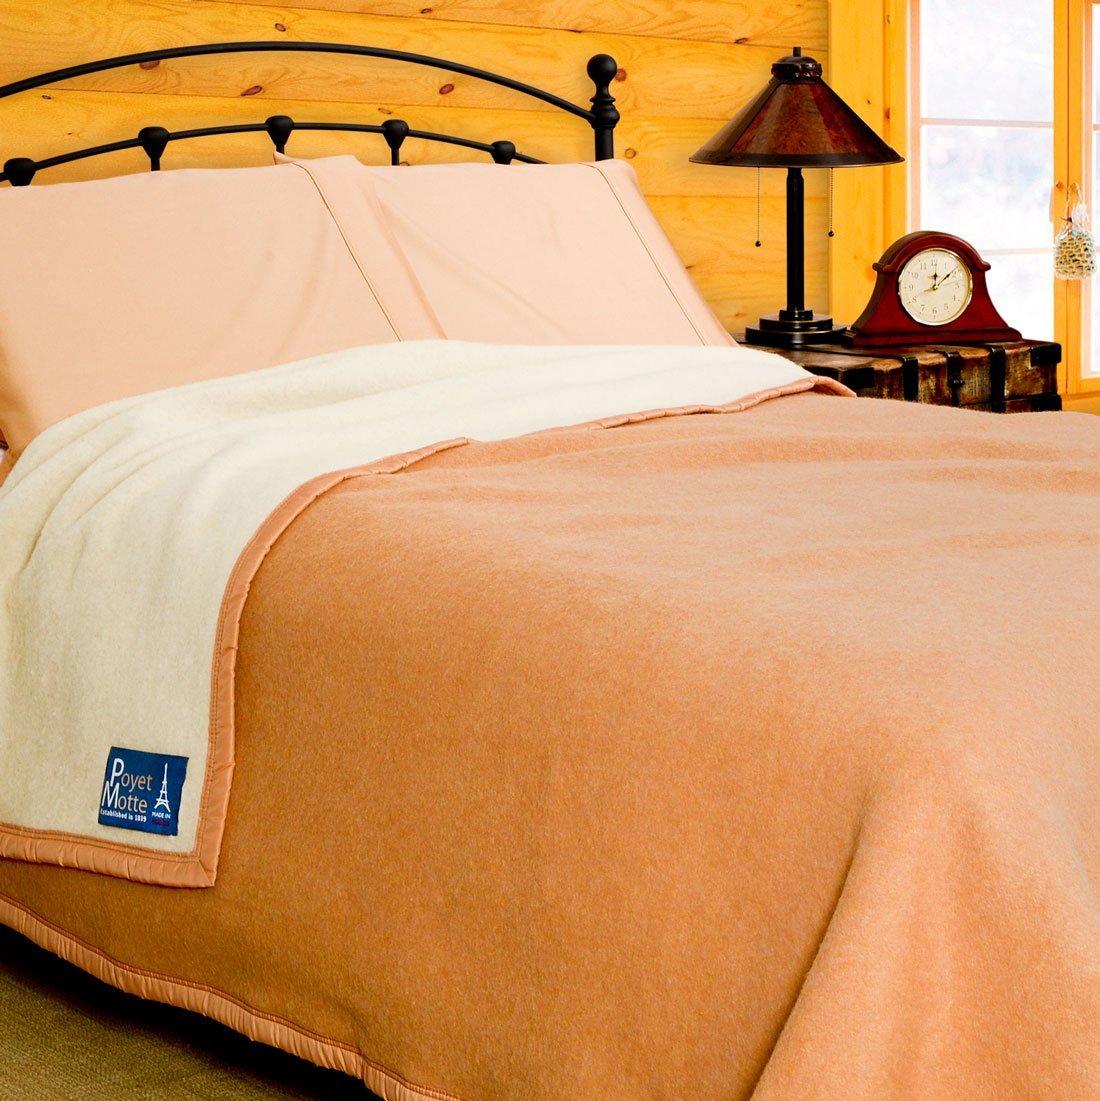 Poyet Motte Aubisque 500GSM Heavyweight 100-Percent Wool Blanket (King, Doe/Natural)